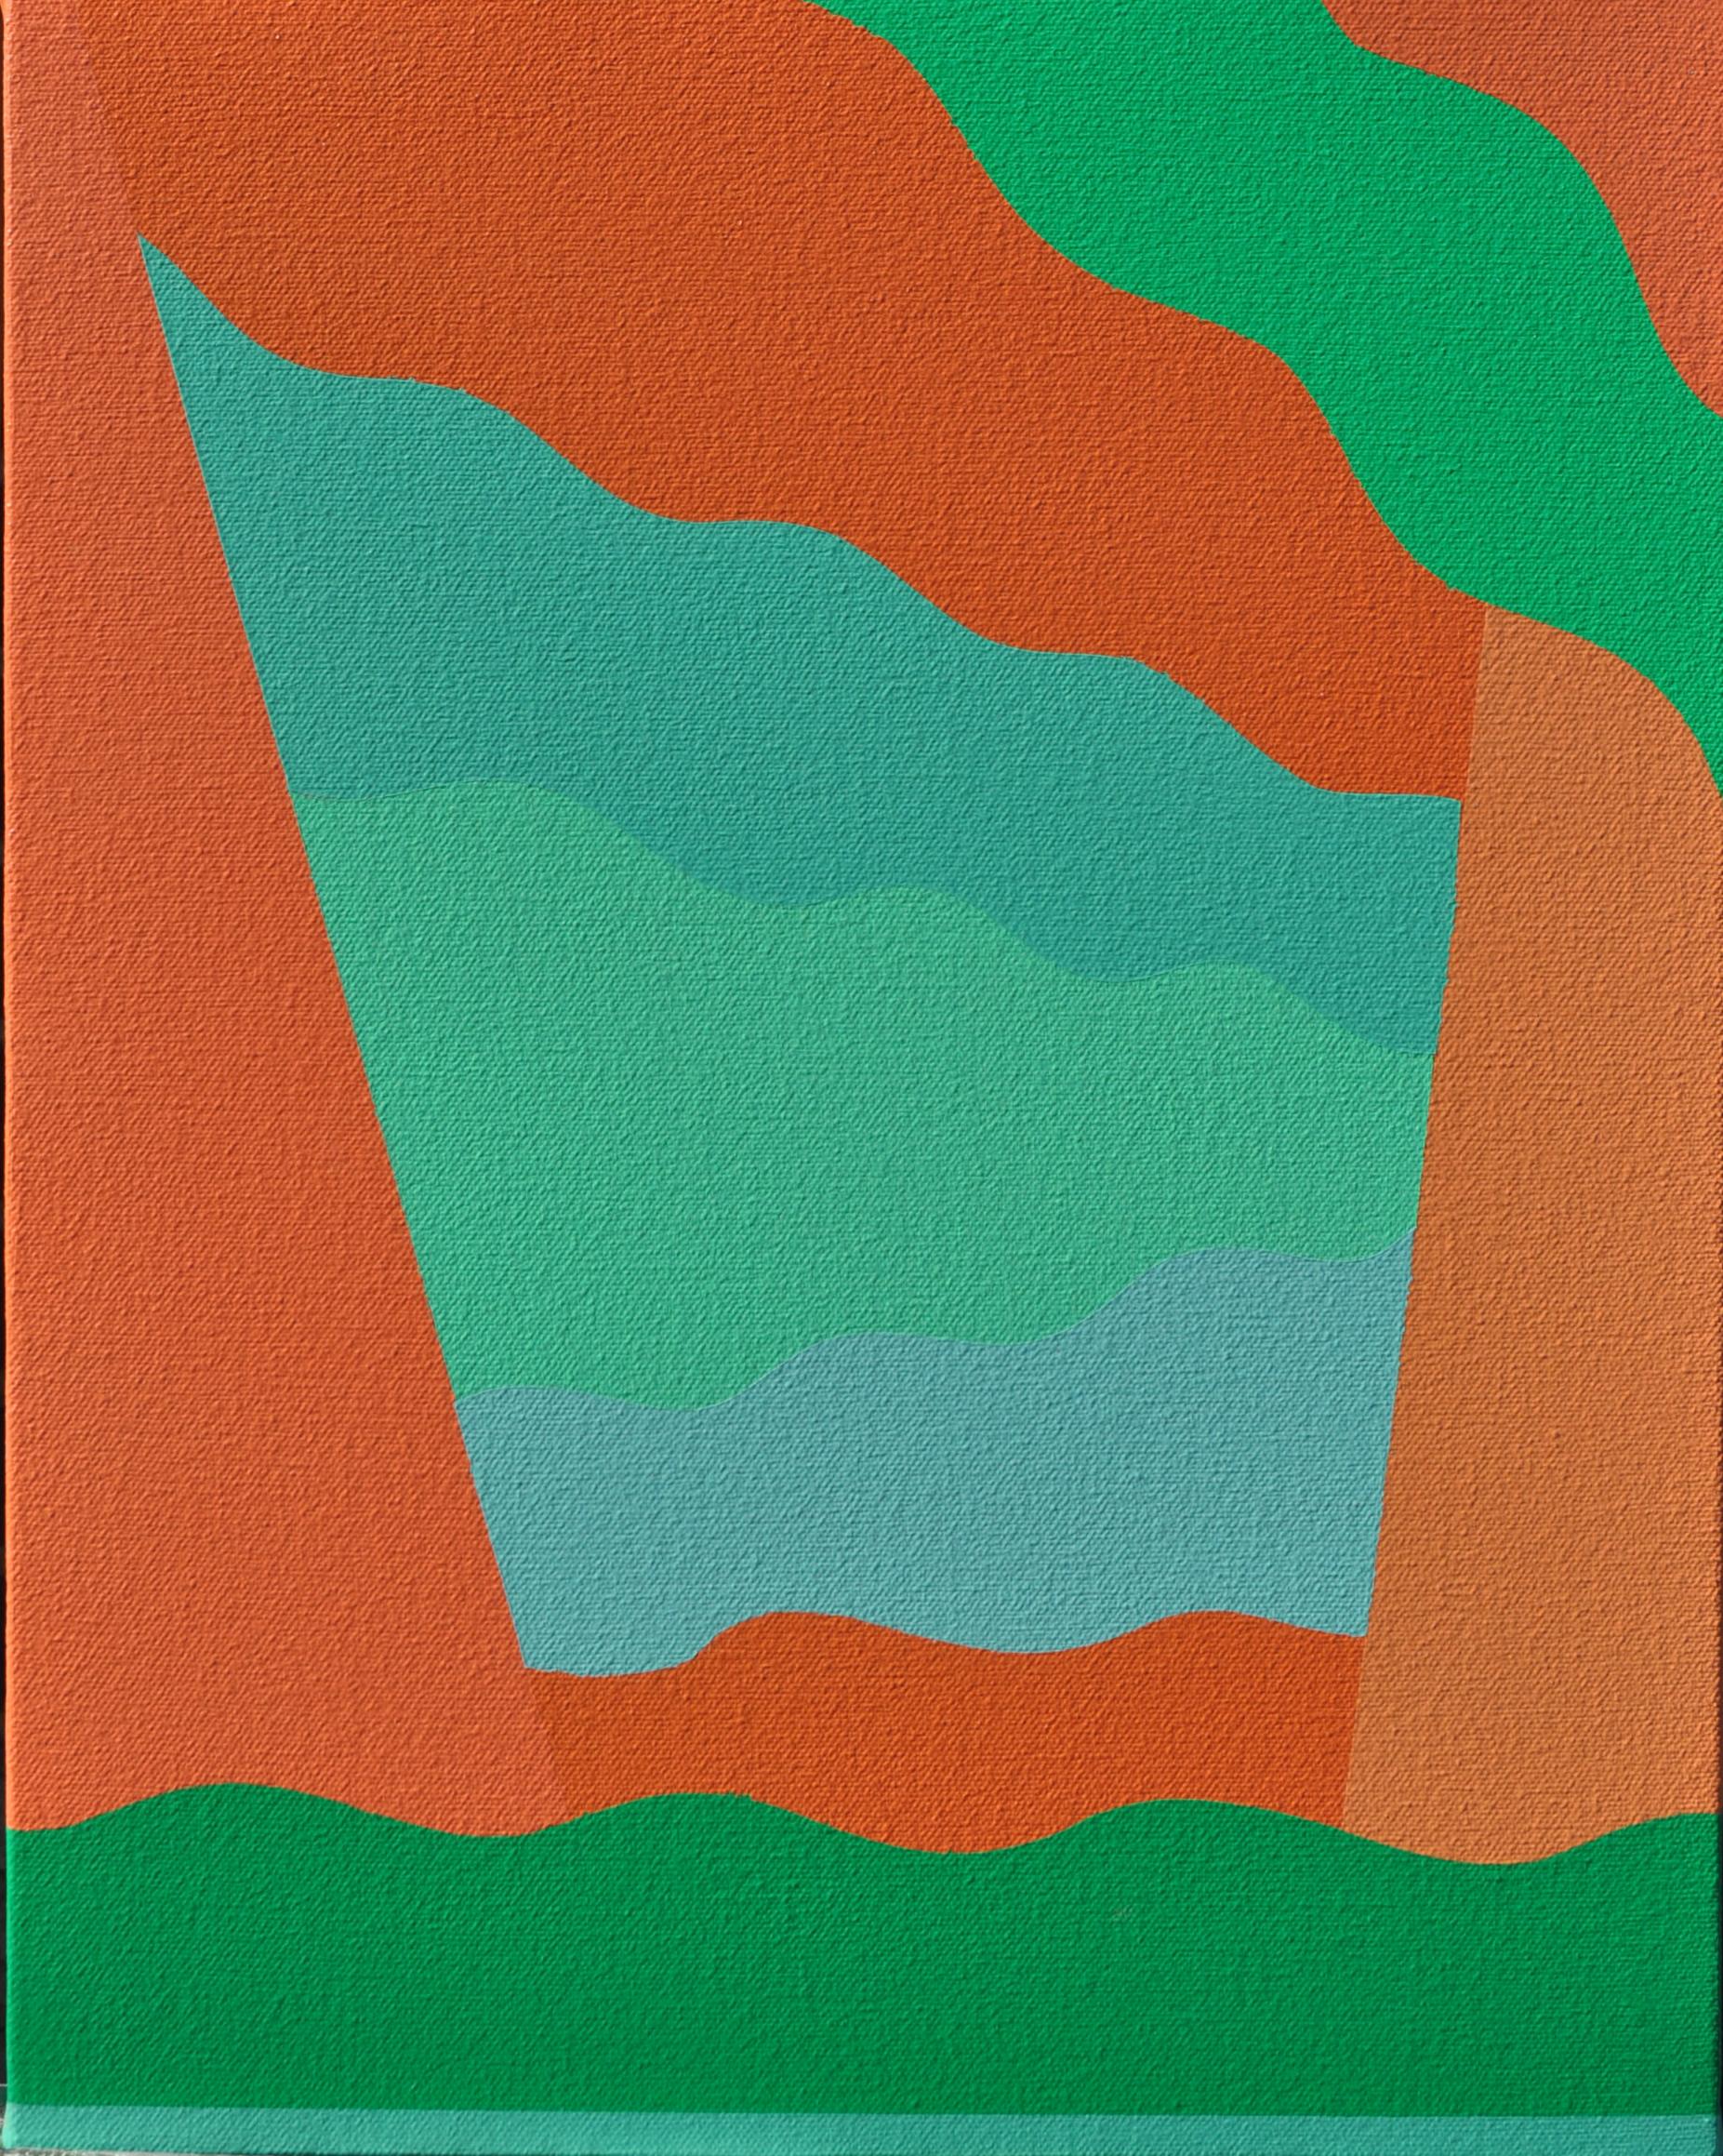 "Orange Buzz (A), 2018, 14"" X 11"", Acrylic on canvas."